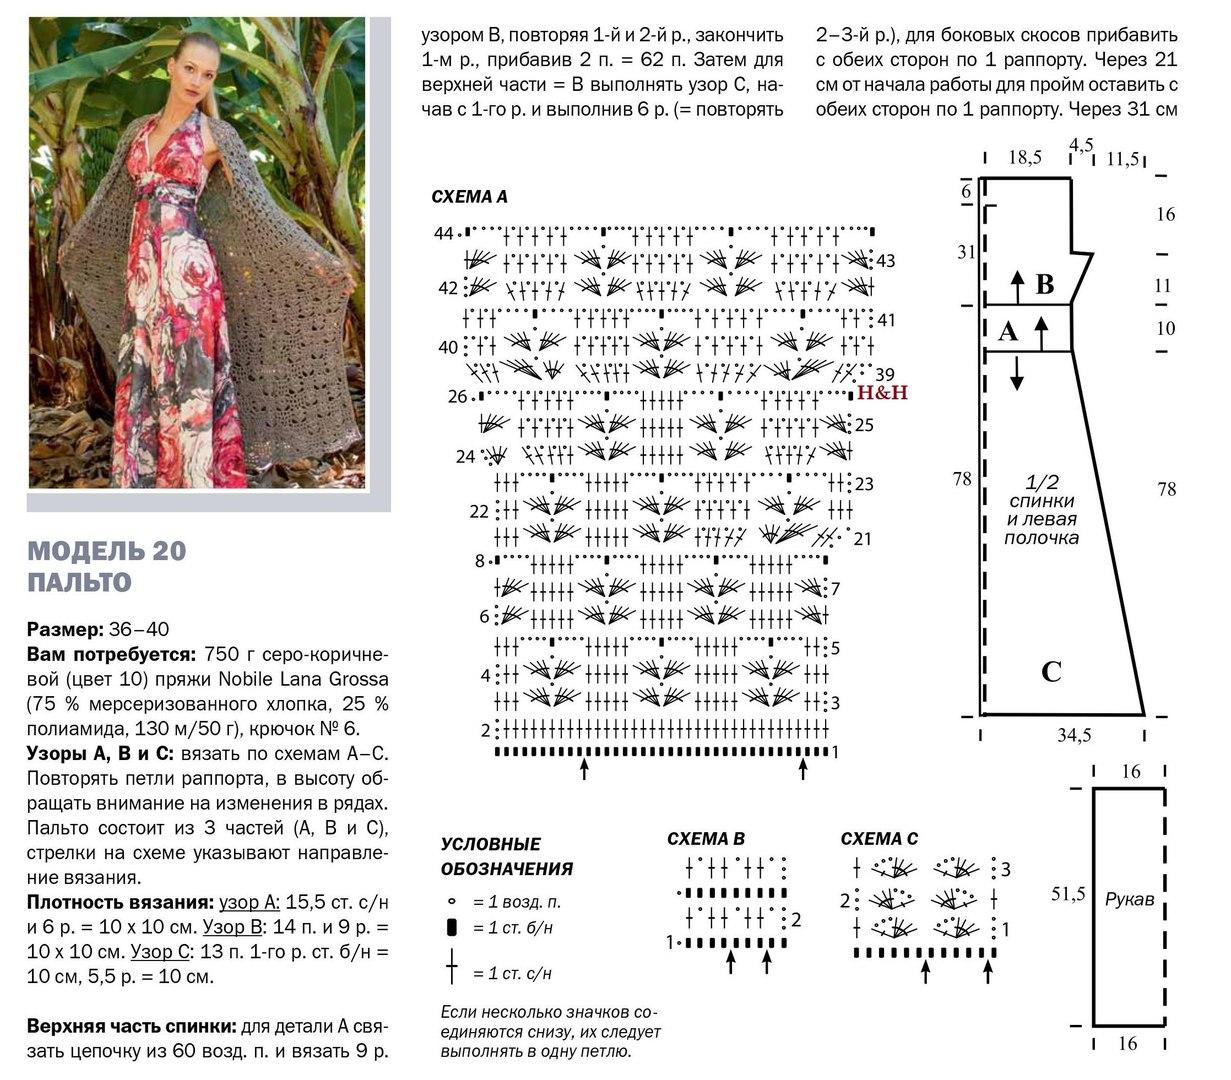 palto krjuchkom dlja zhenshhin 2 - Вязаное пальто крючком для женщин схемы и описание